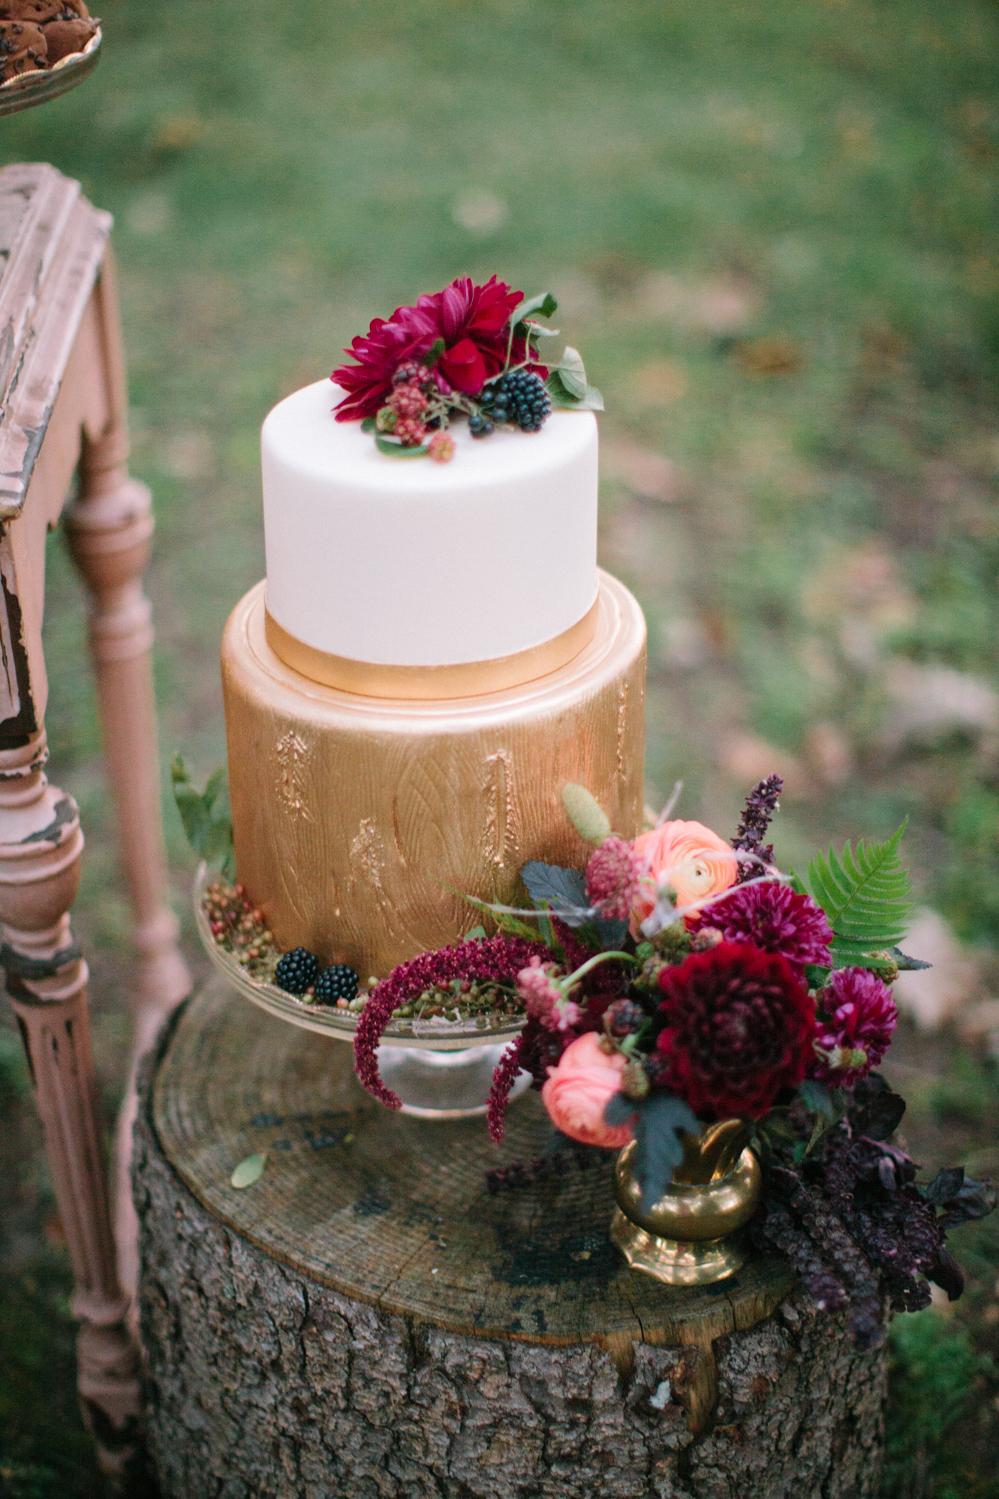 Ashley_D_Photography_Rustic_Woodland_Cake